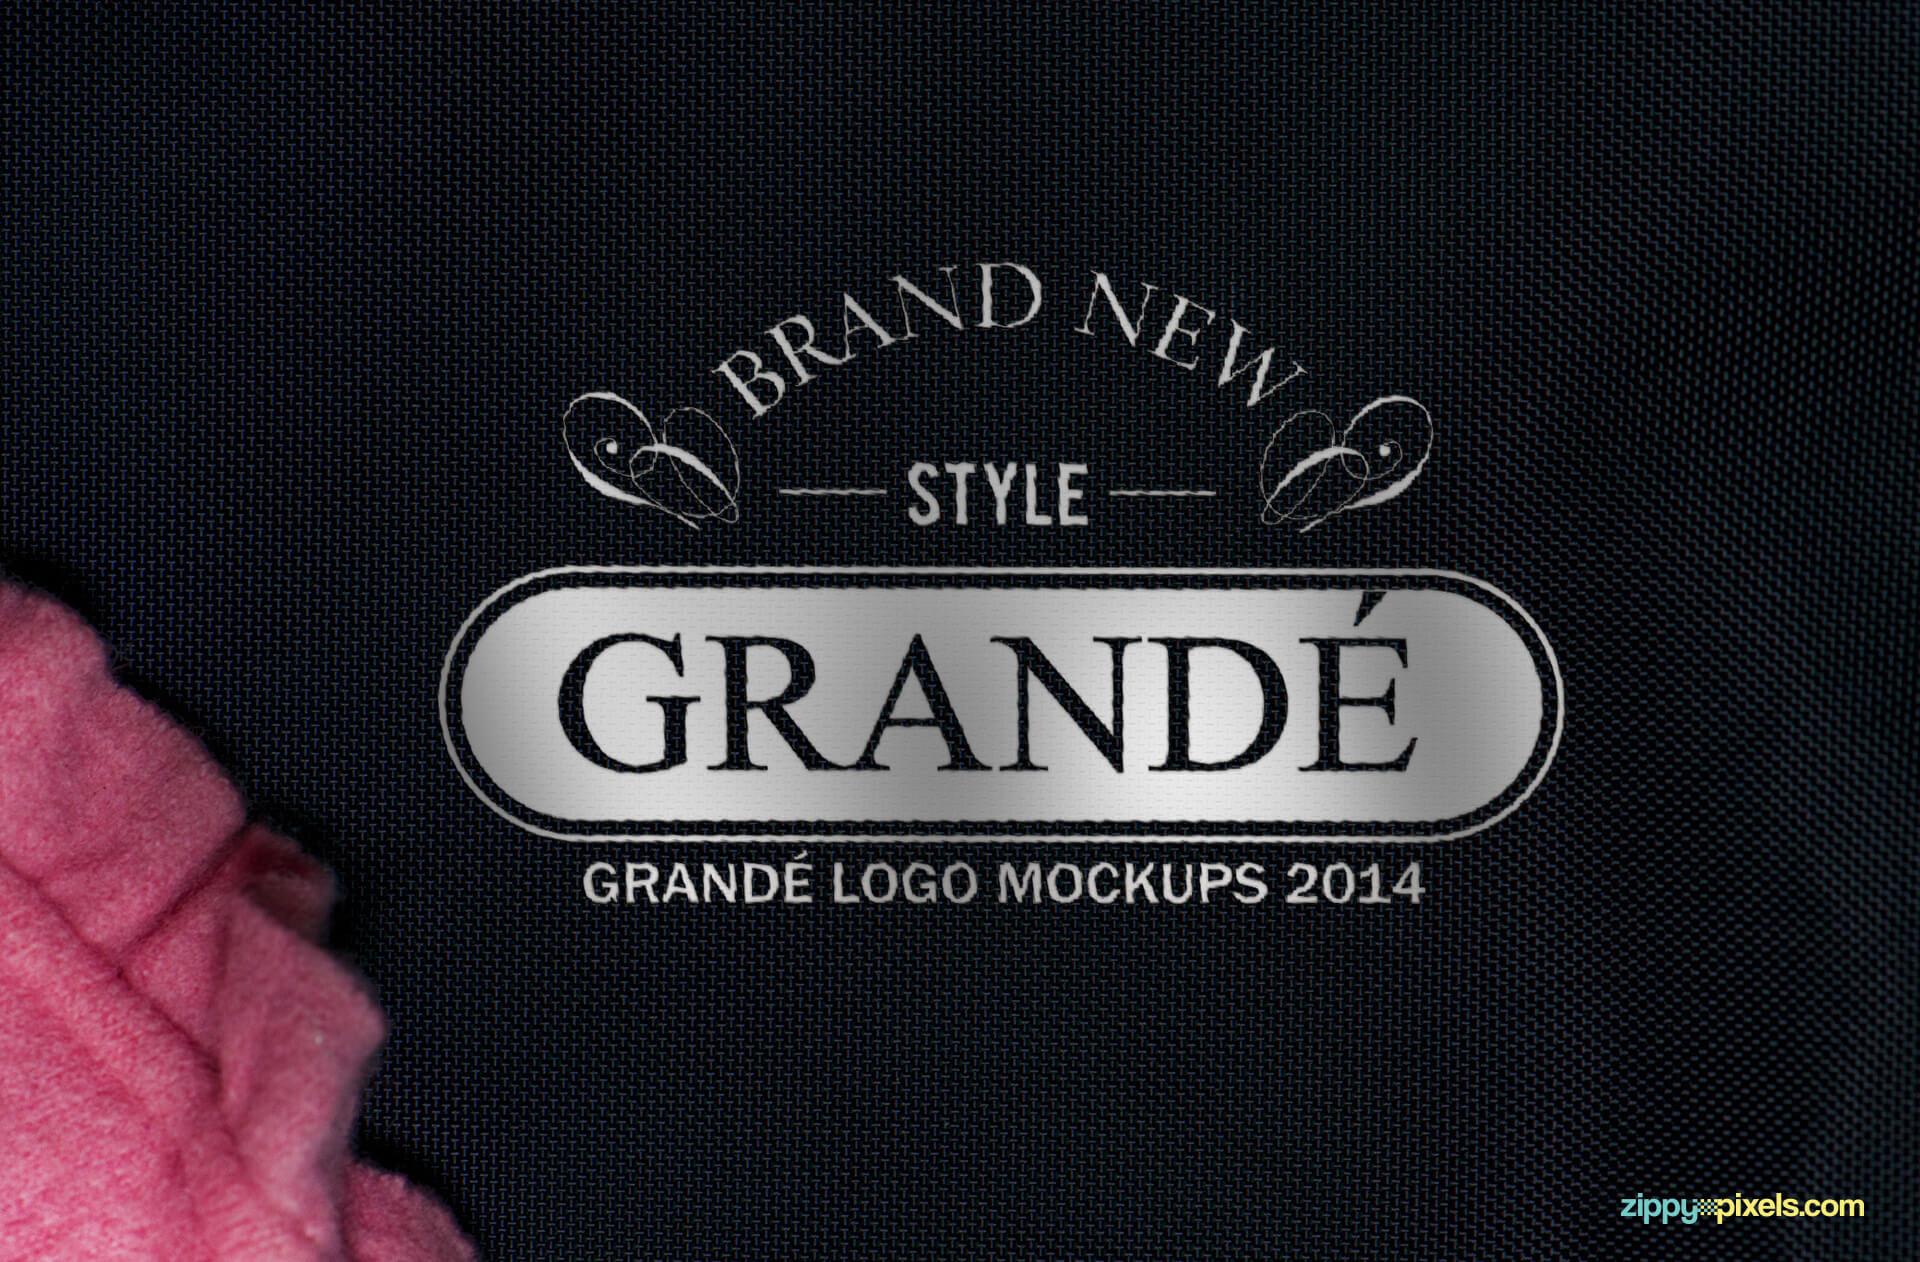 Printed Fabric Logo Mockup